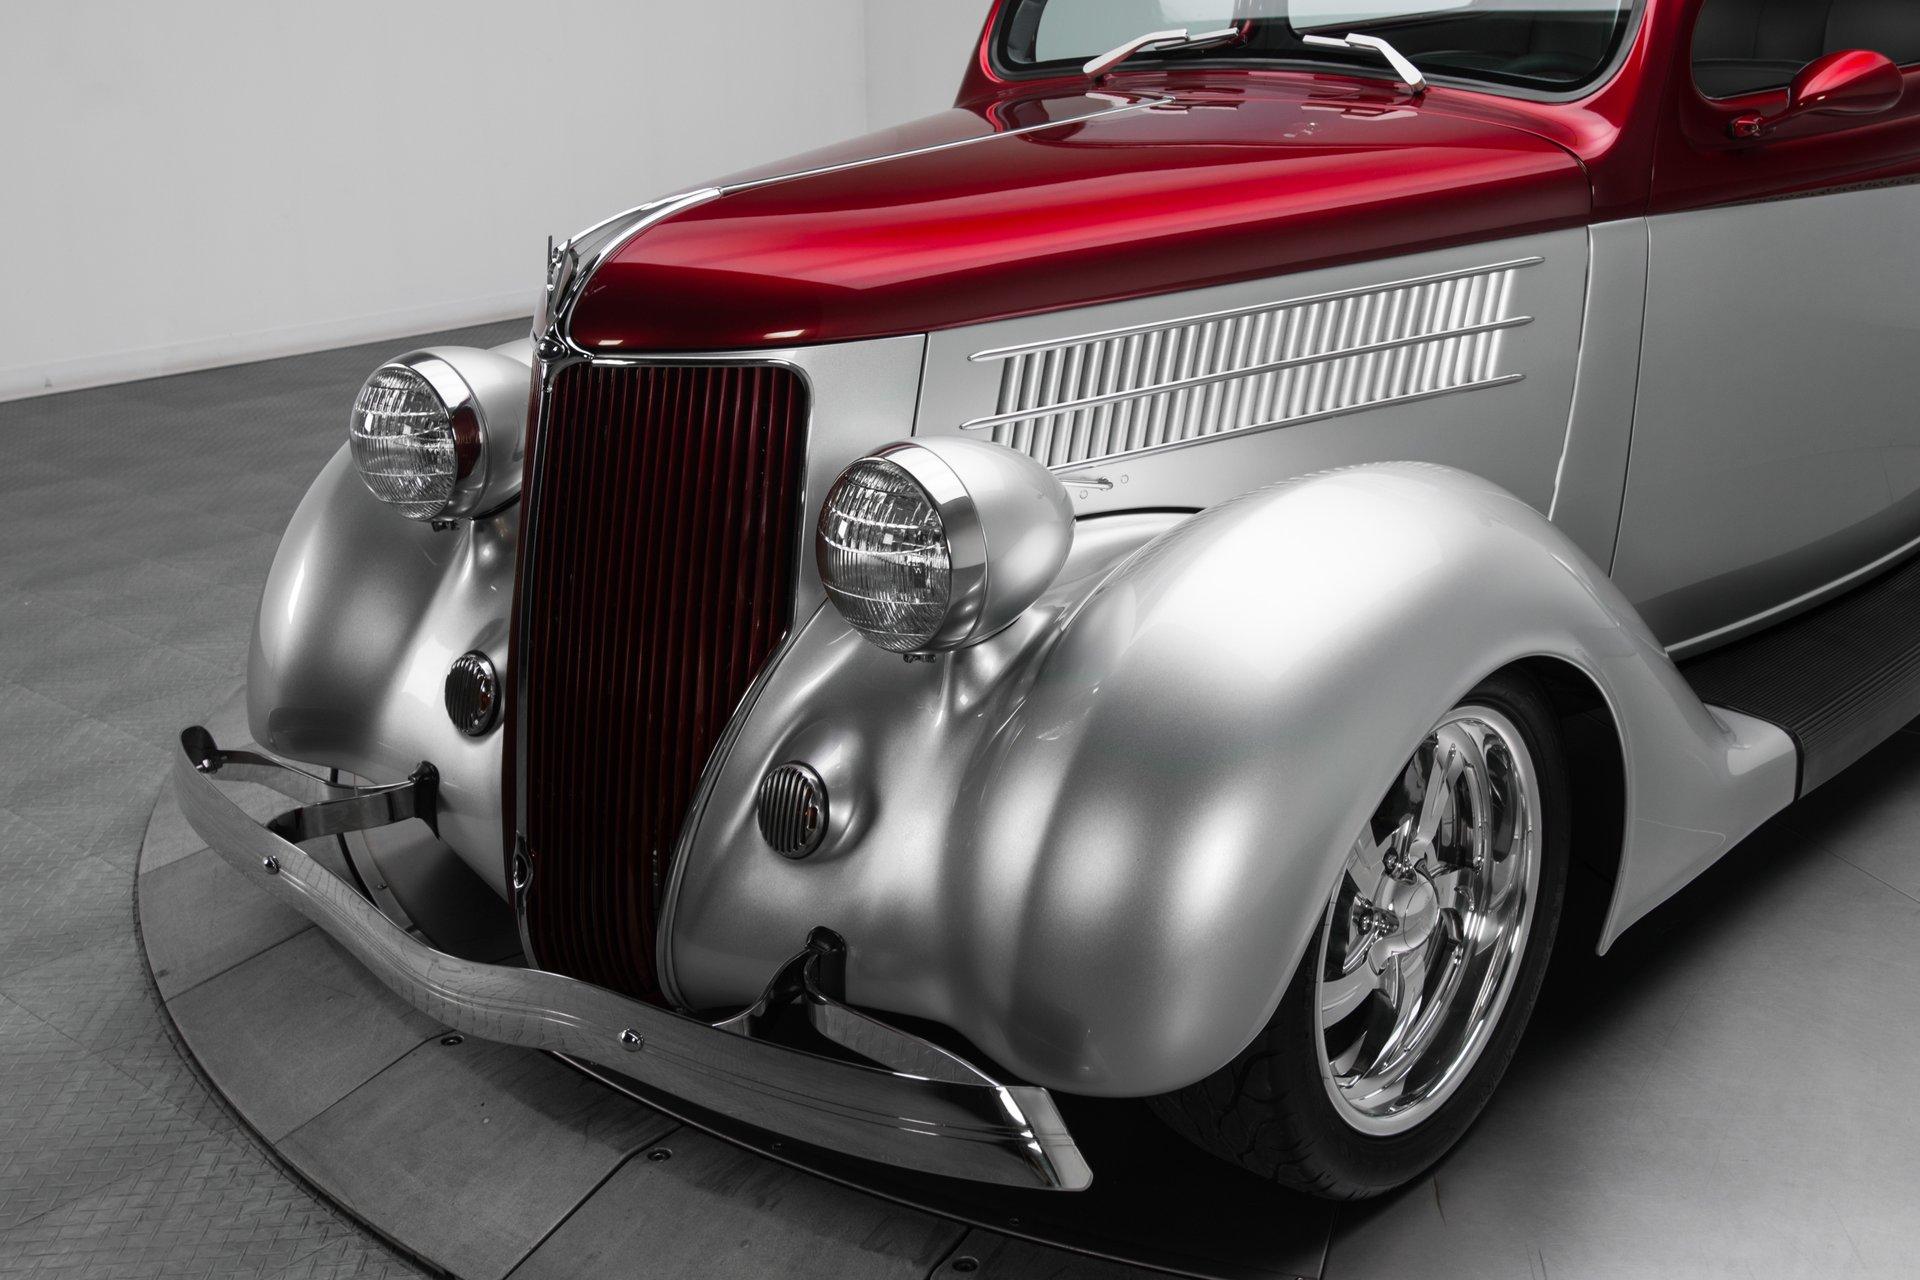 135219 1936 Ford Sedan RK Motors Classic Cars for Sale